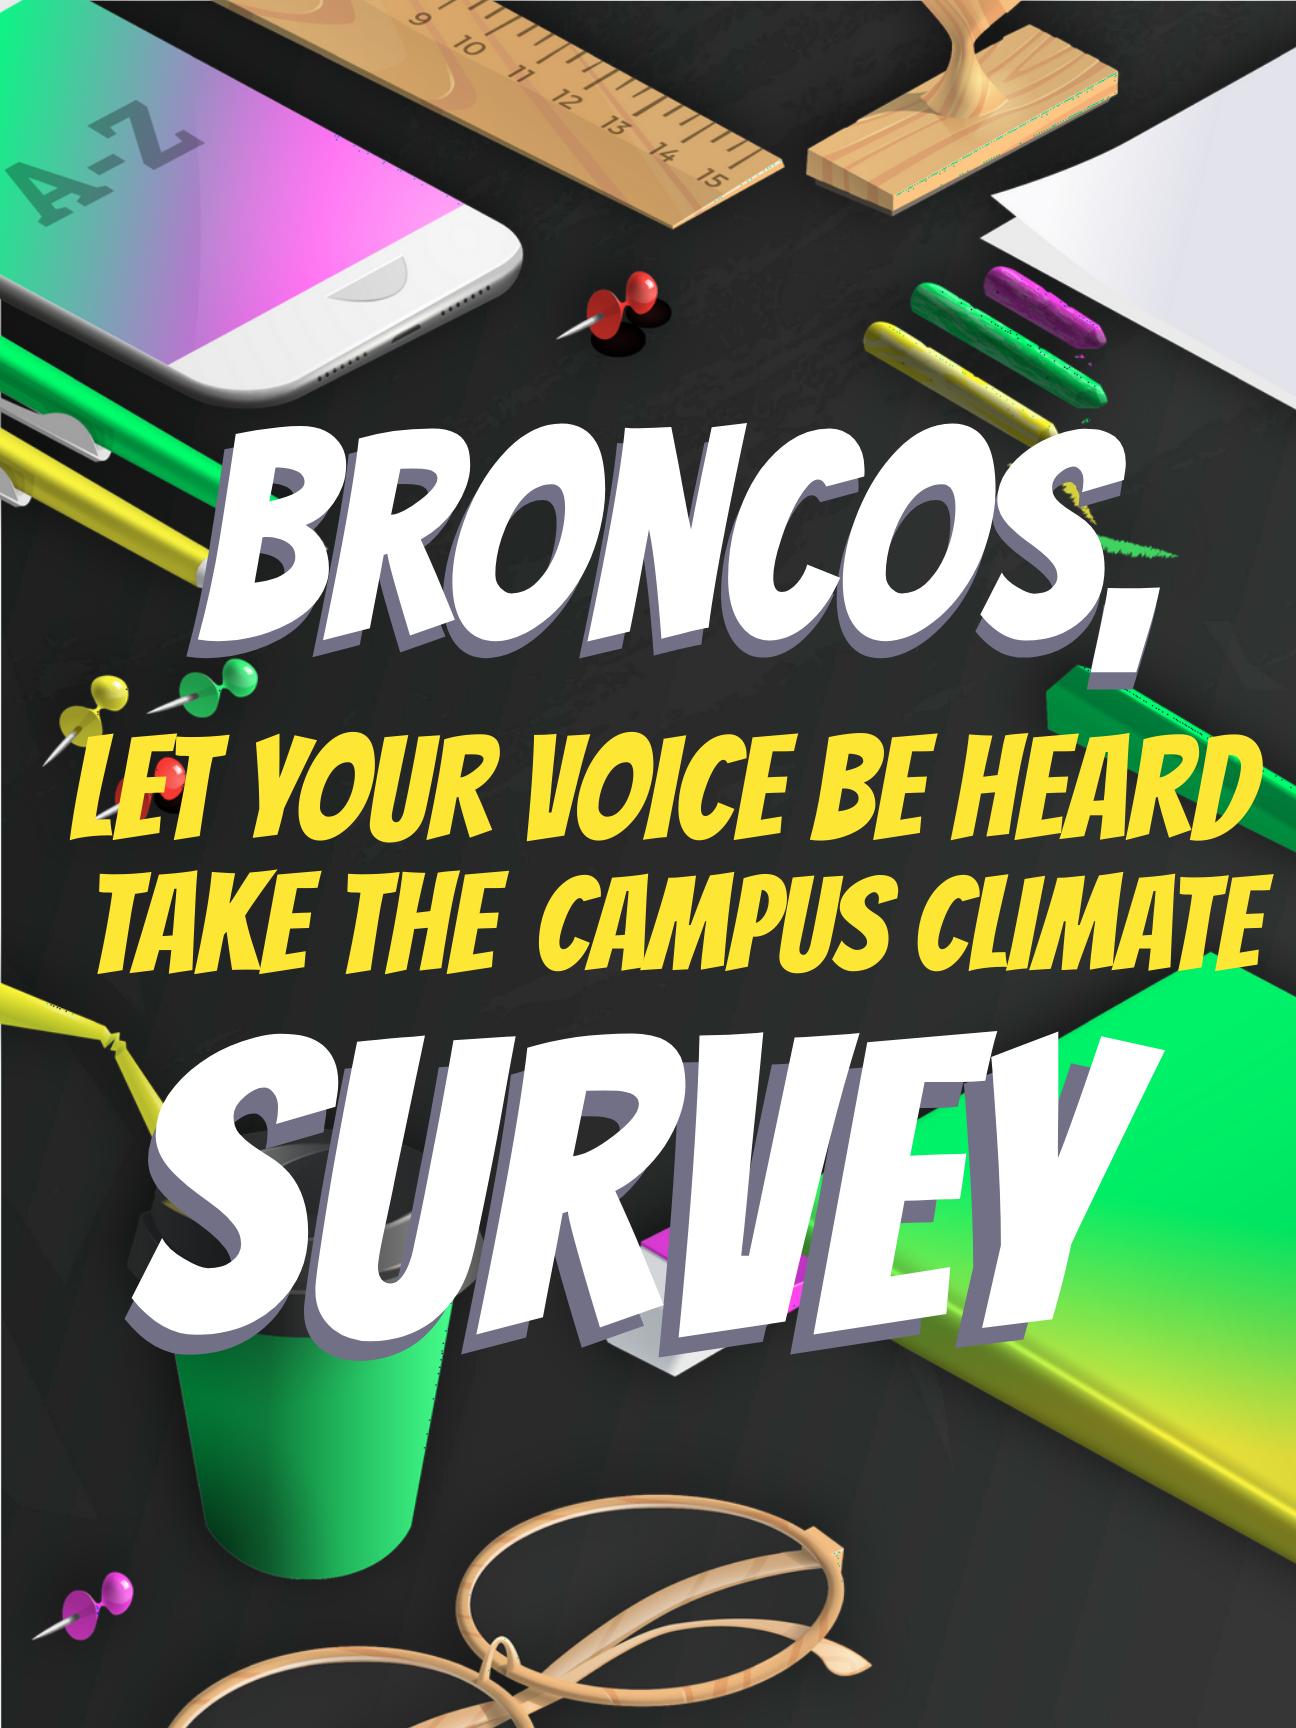 Spring 2020 Campus Climate Survey